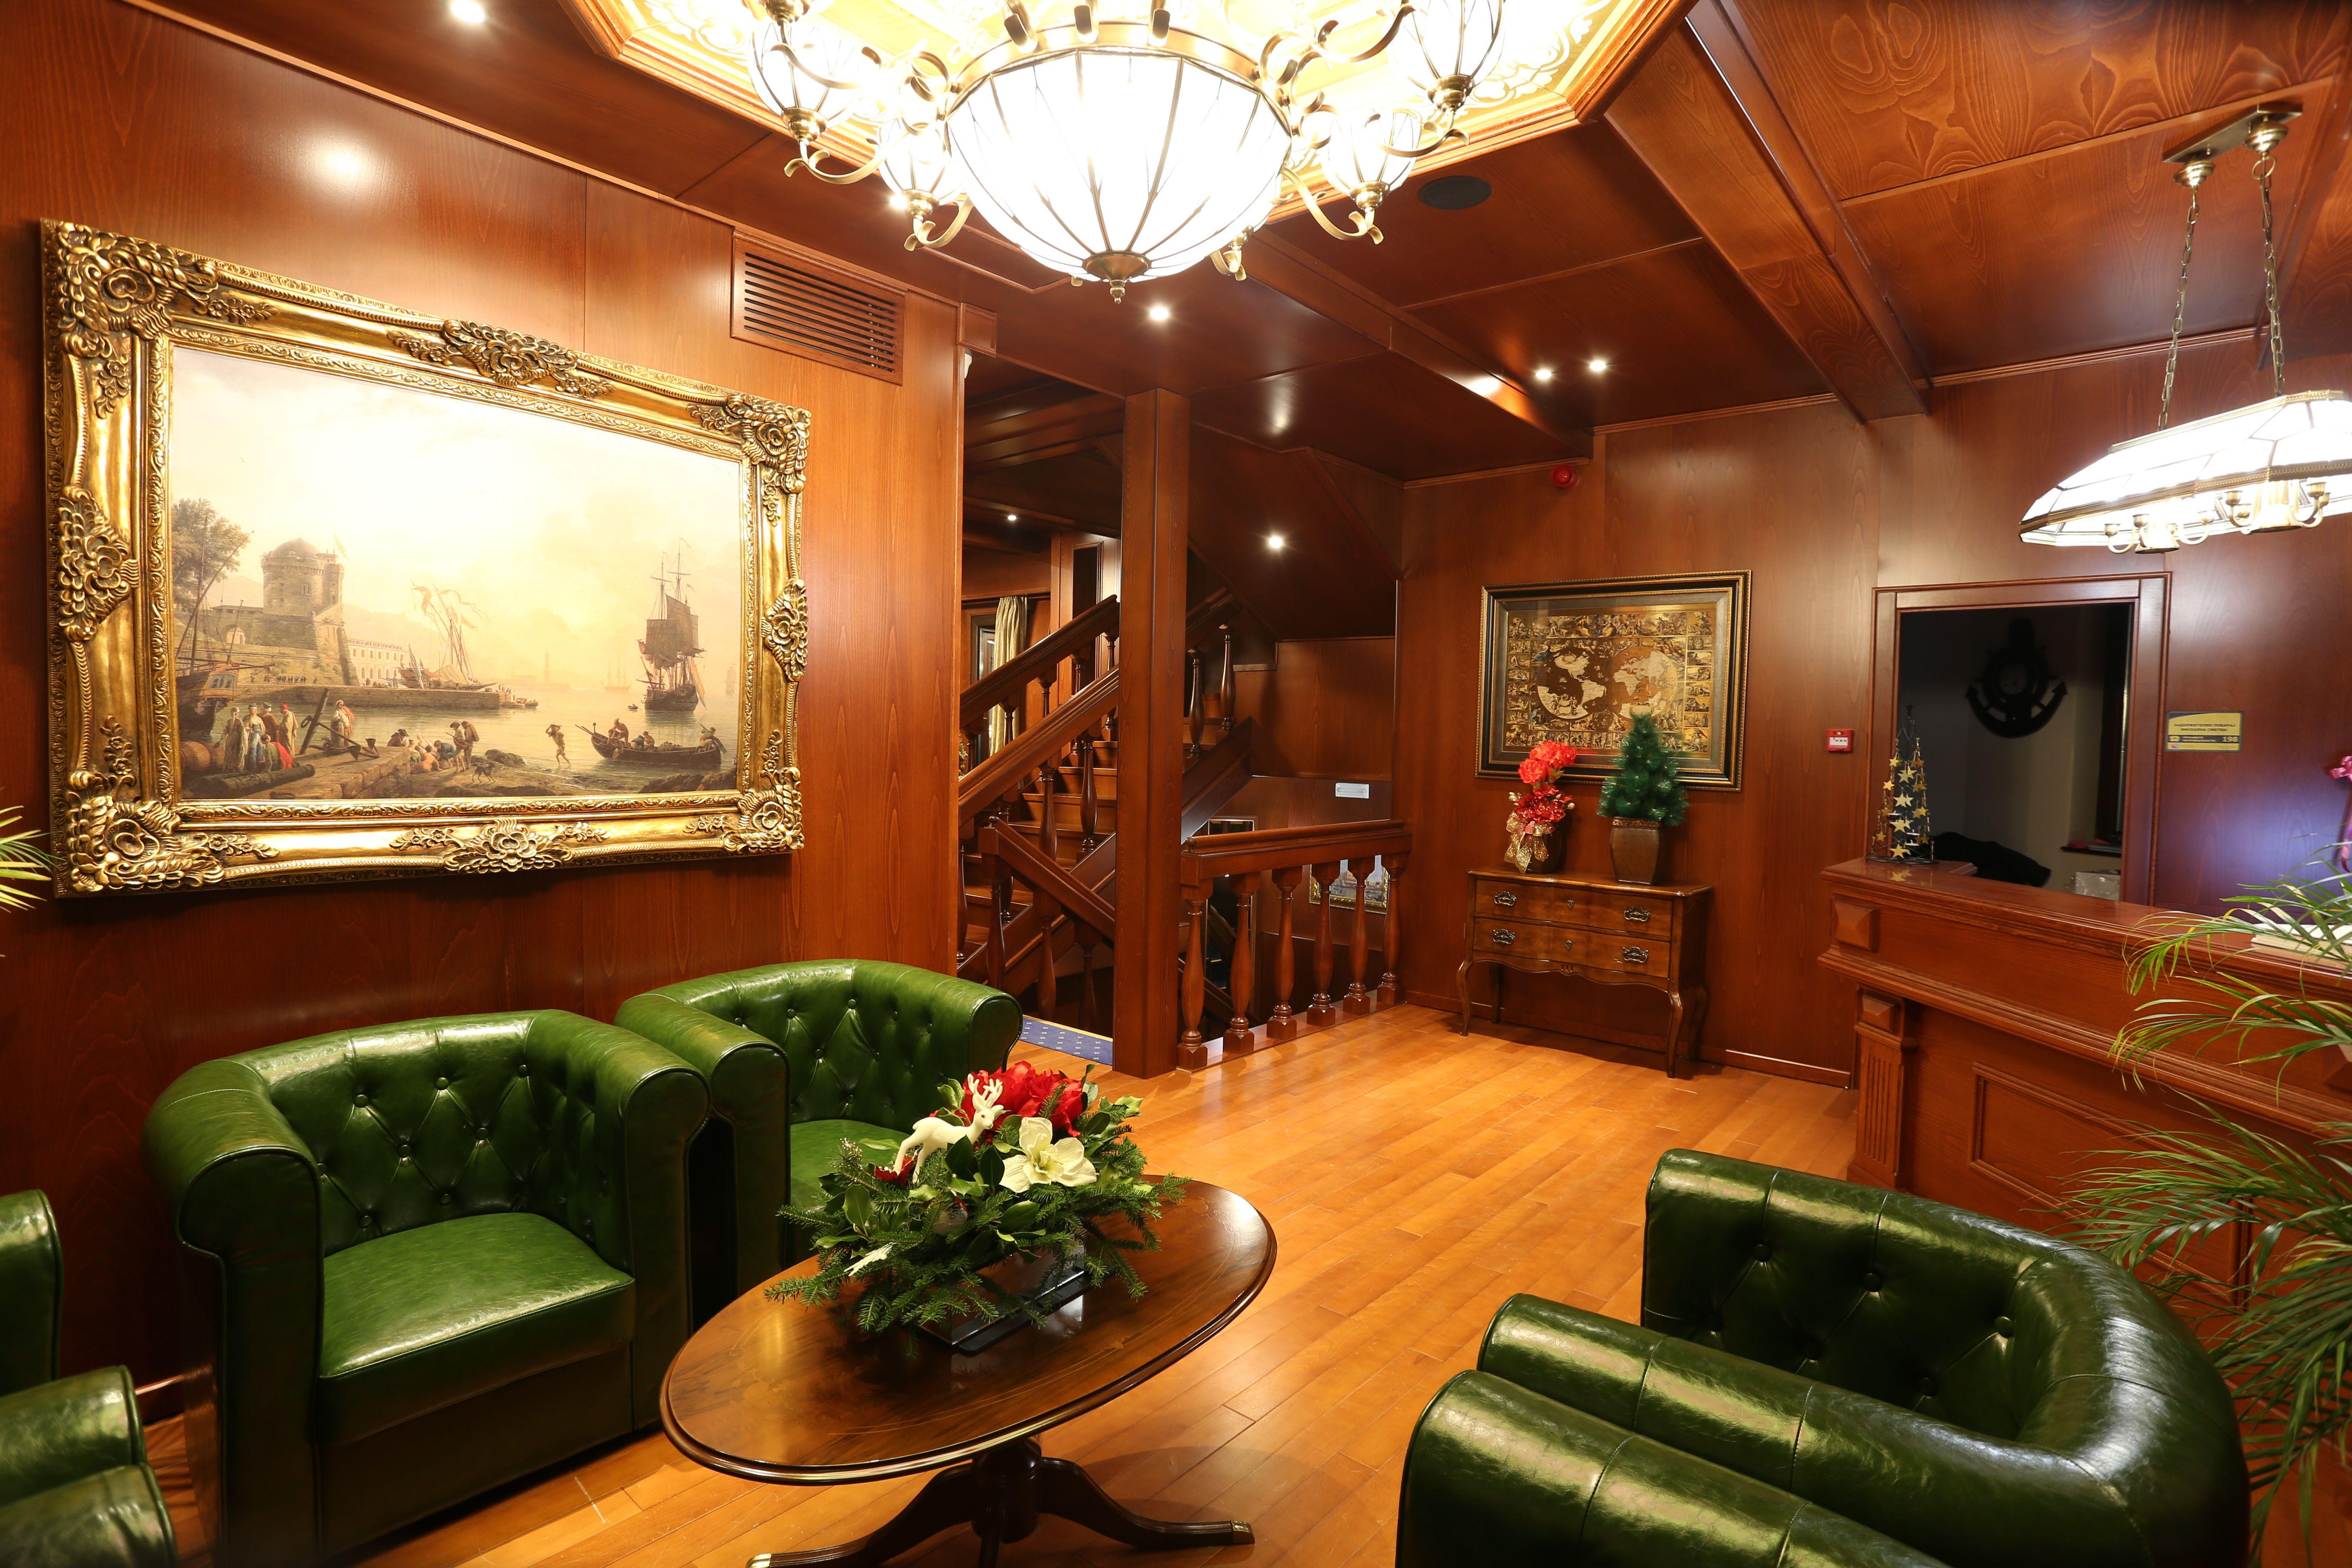 Pin by DIVAJN on BOAT INTERIOR DECOR   Pinterest   Boat interior